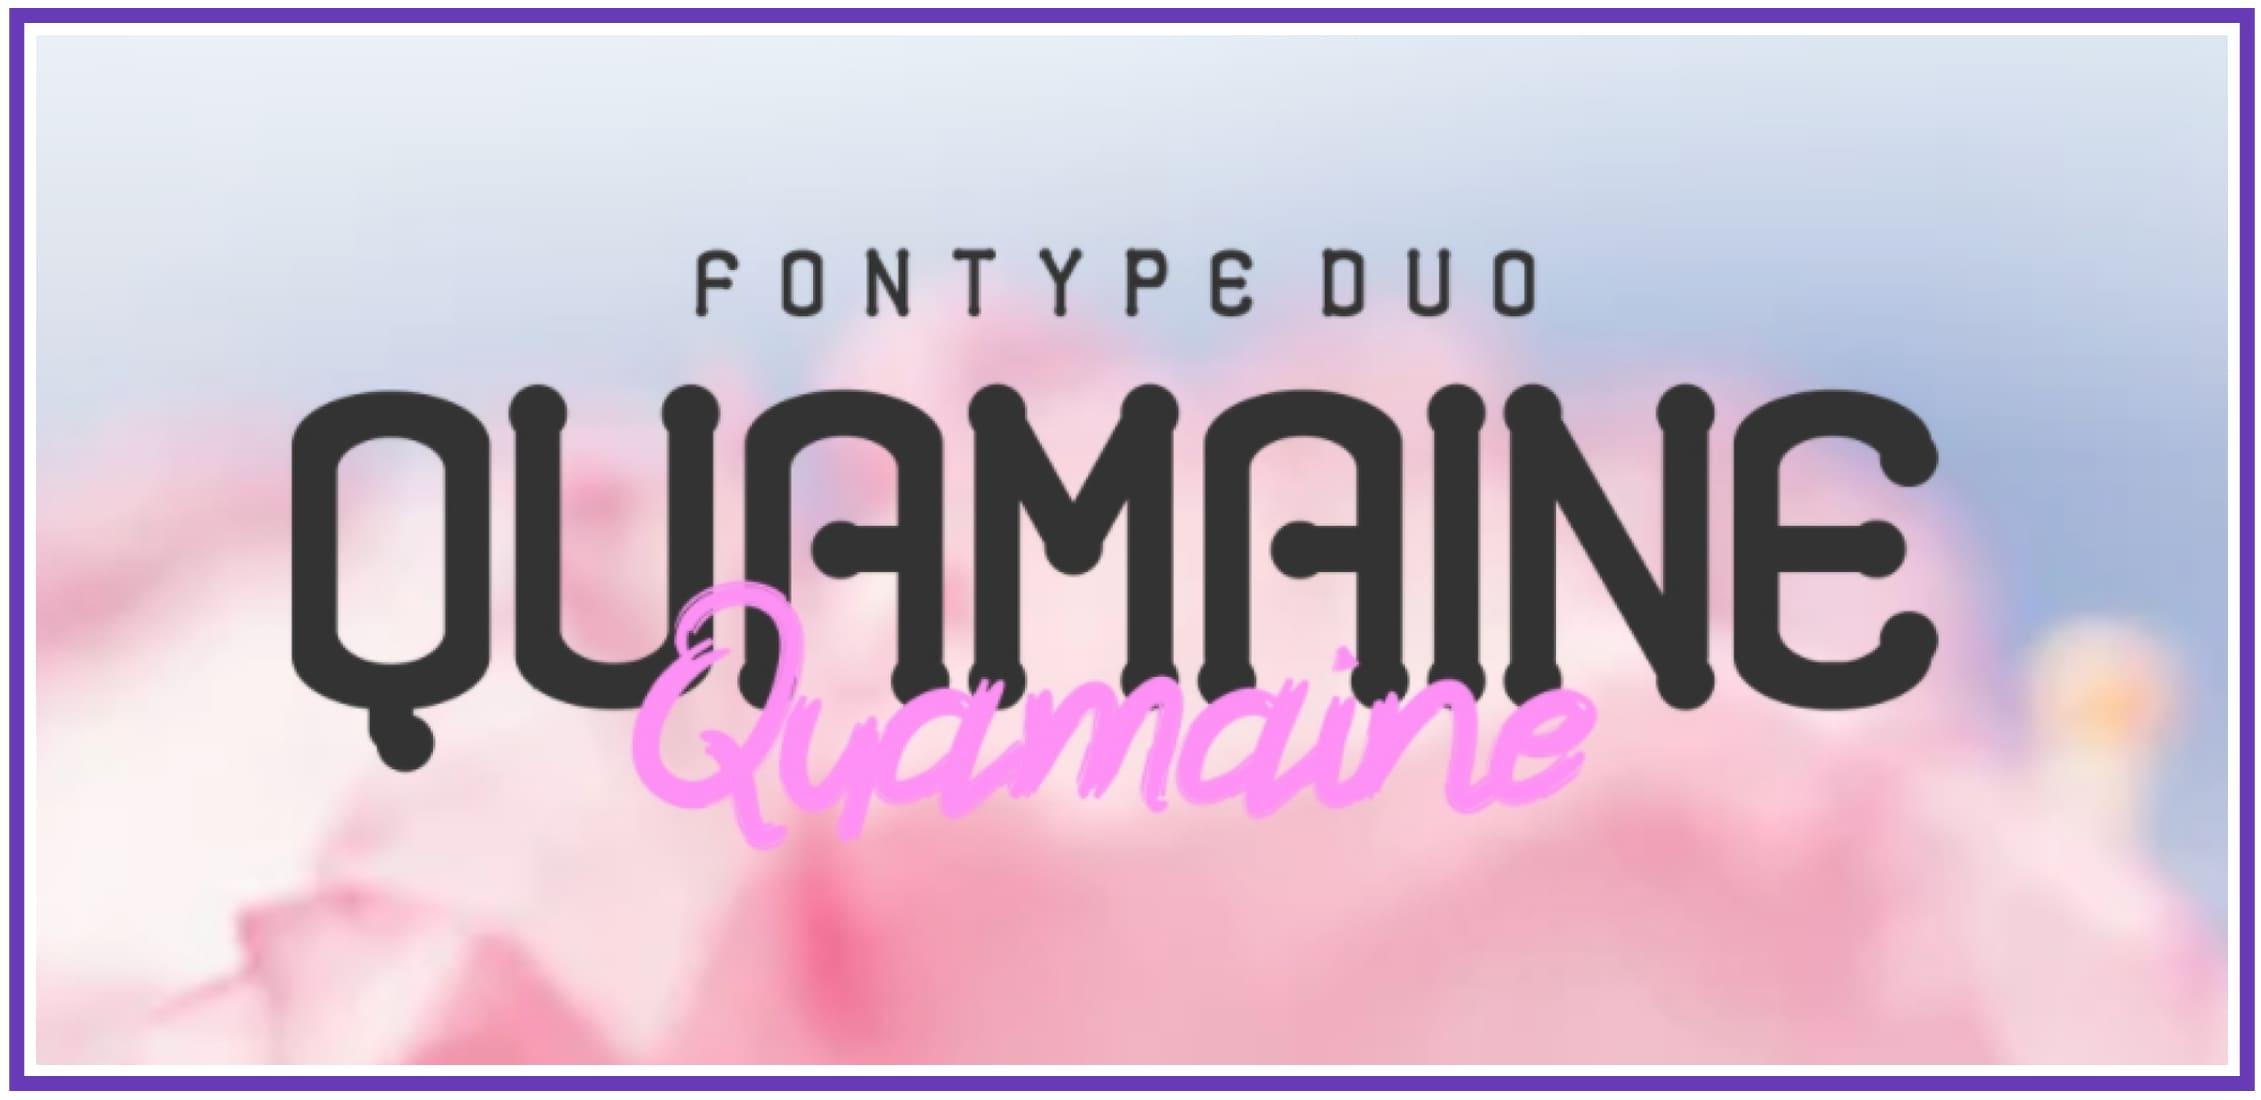 Beautiful Quamaine. Masculine Font.